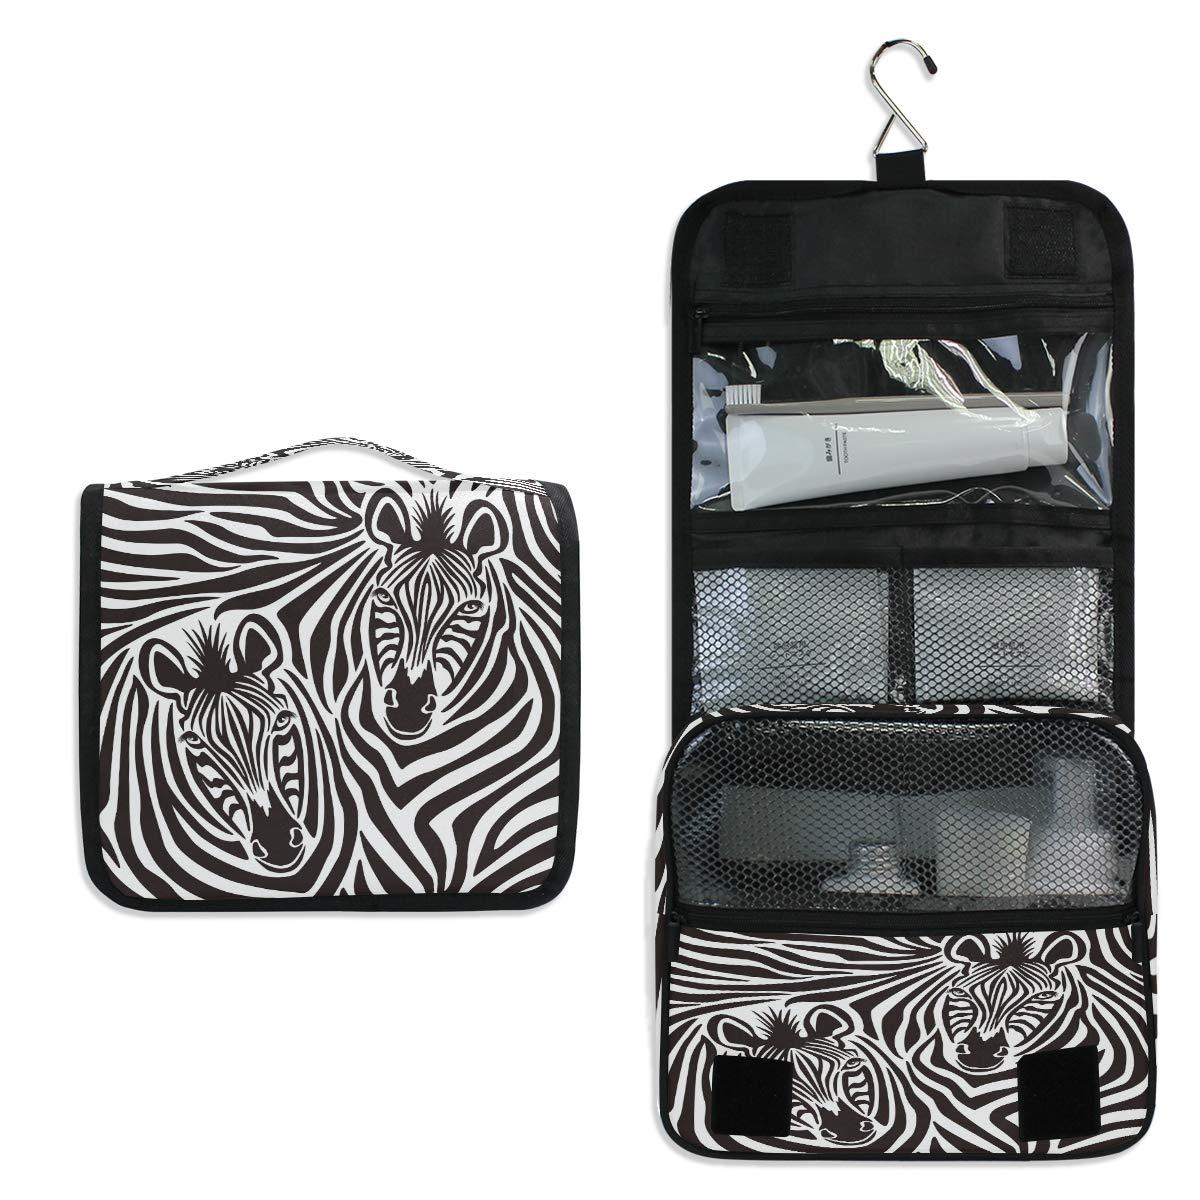 CCDMJ Hanging Toiletry Bag Animal Zebra Head Print Cosmetics Makeup Bags with Hook Portable Multifunction Travel bag Wash Bathroom Organizer for Women Girls